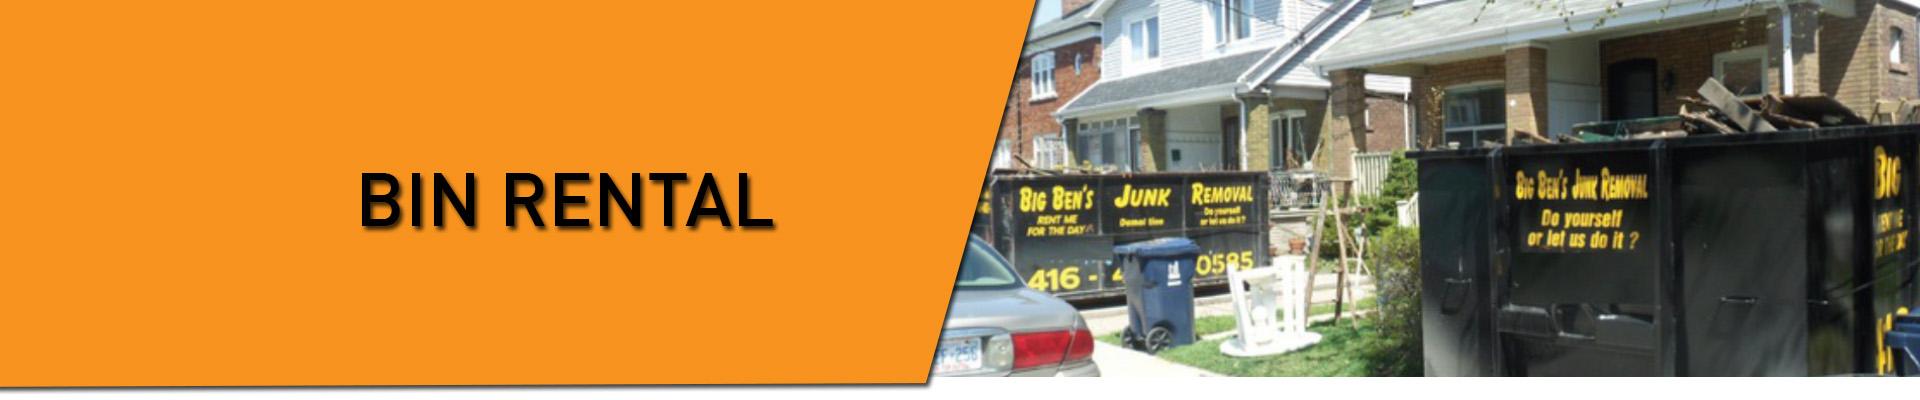 Big Ben's Junk Removal :: Bin Rental